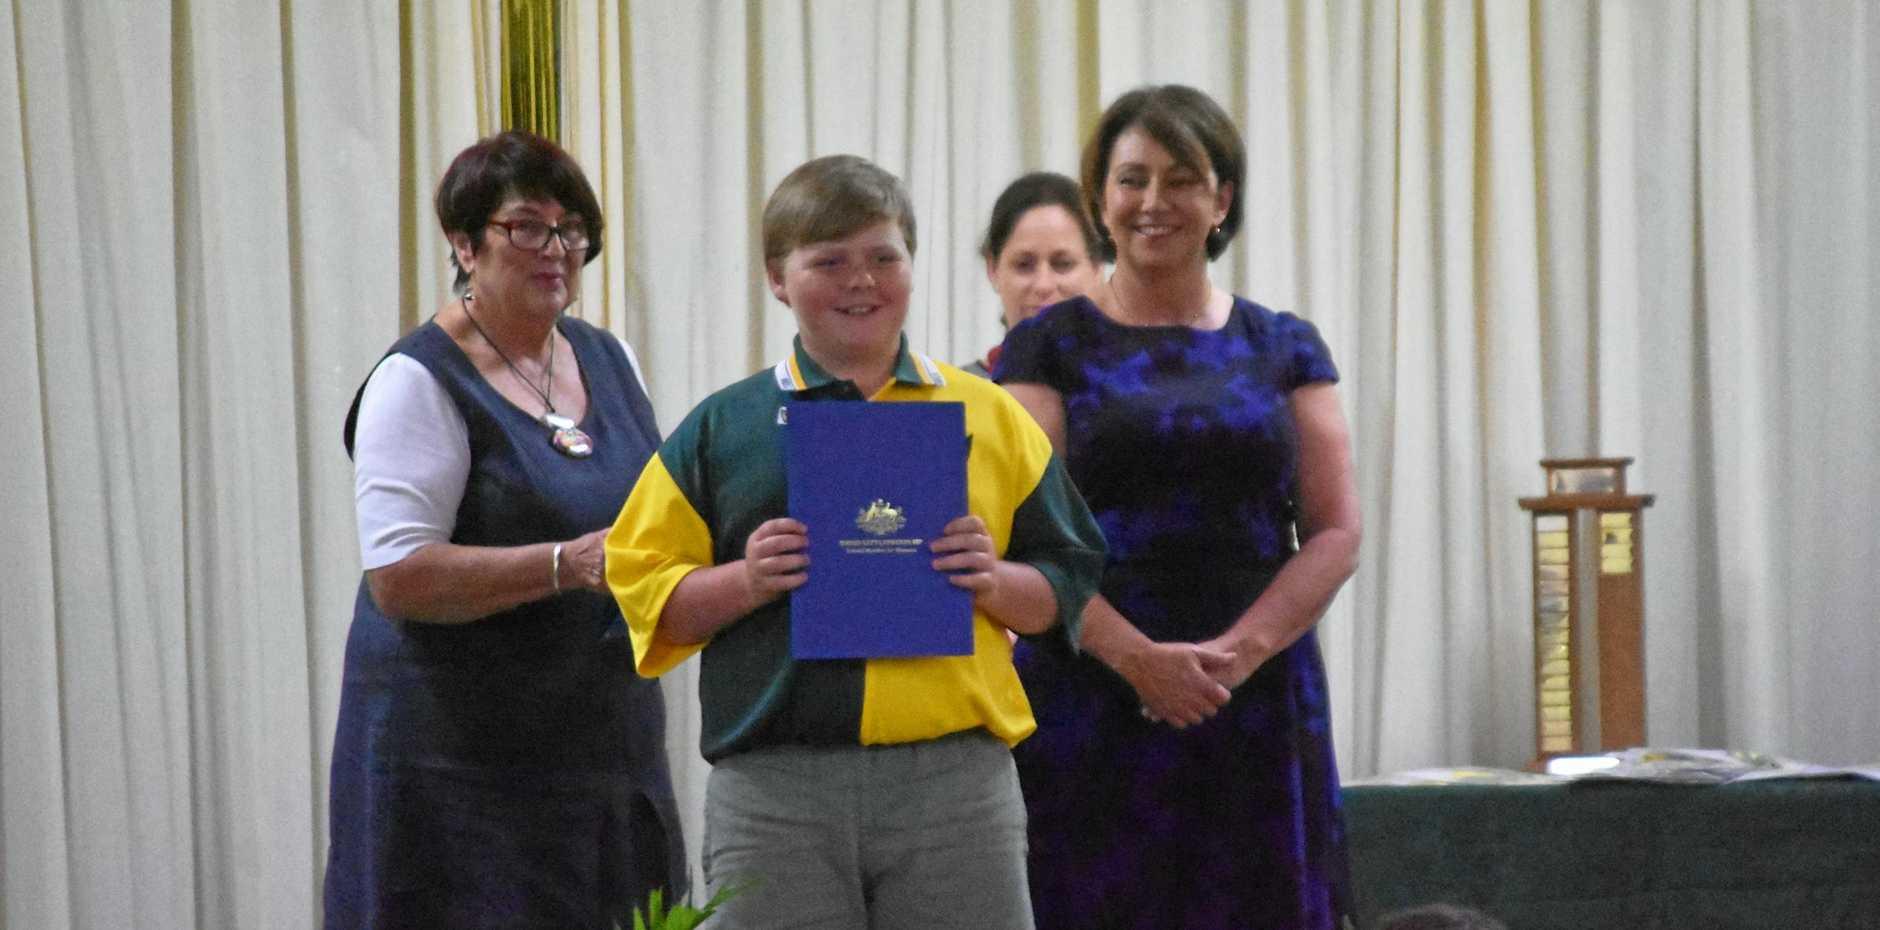 PROUD: Patrick Coleman with the David Littleproud Merit Award.